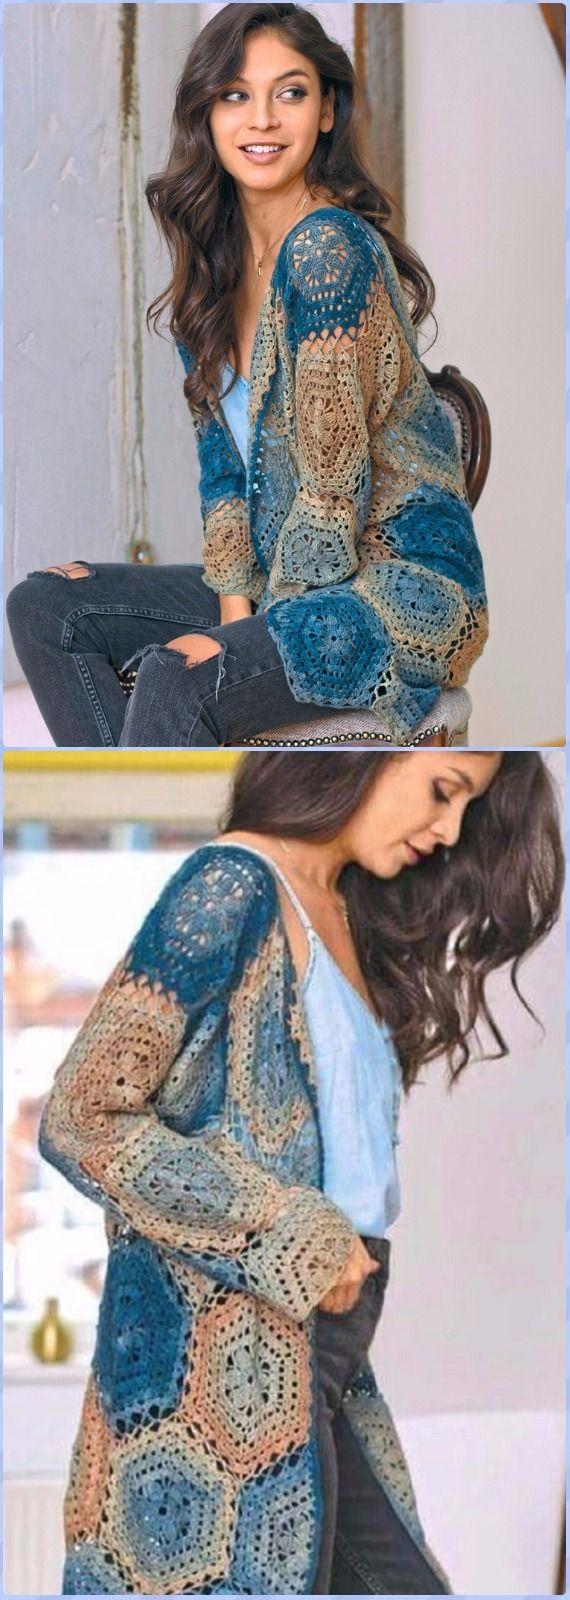 Crochet Summer Hexagon CardiganFree Pattern - Crochet Women Sweater Coat & Cardigan Free Patterns